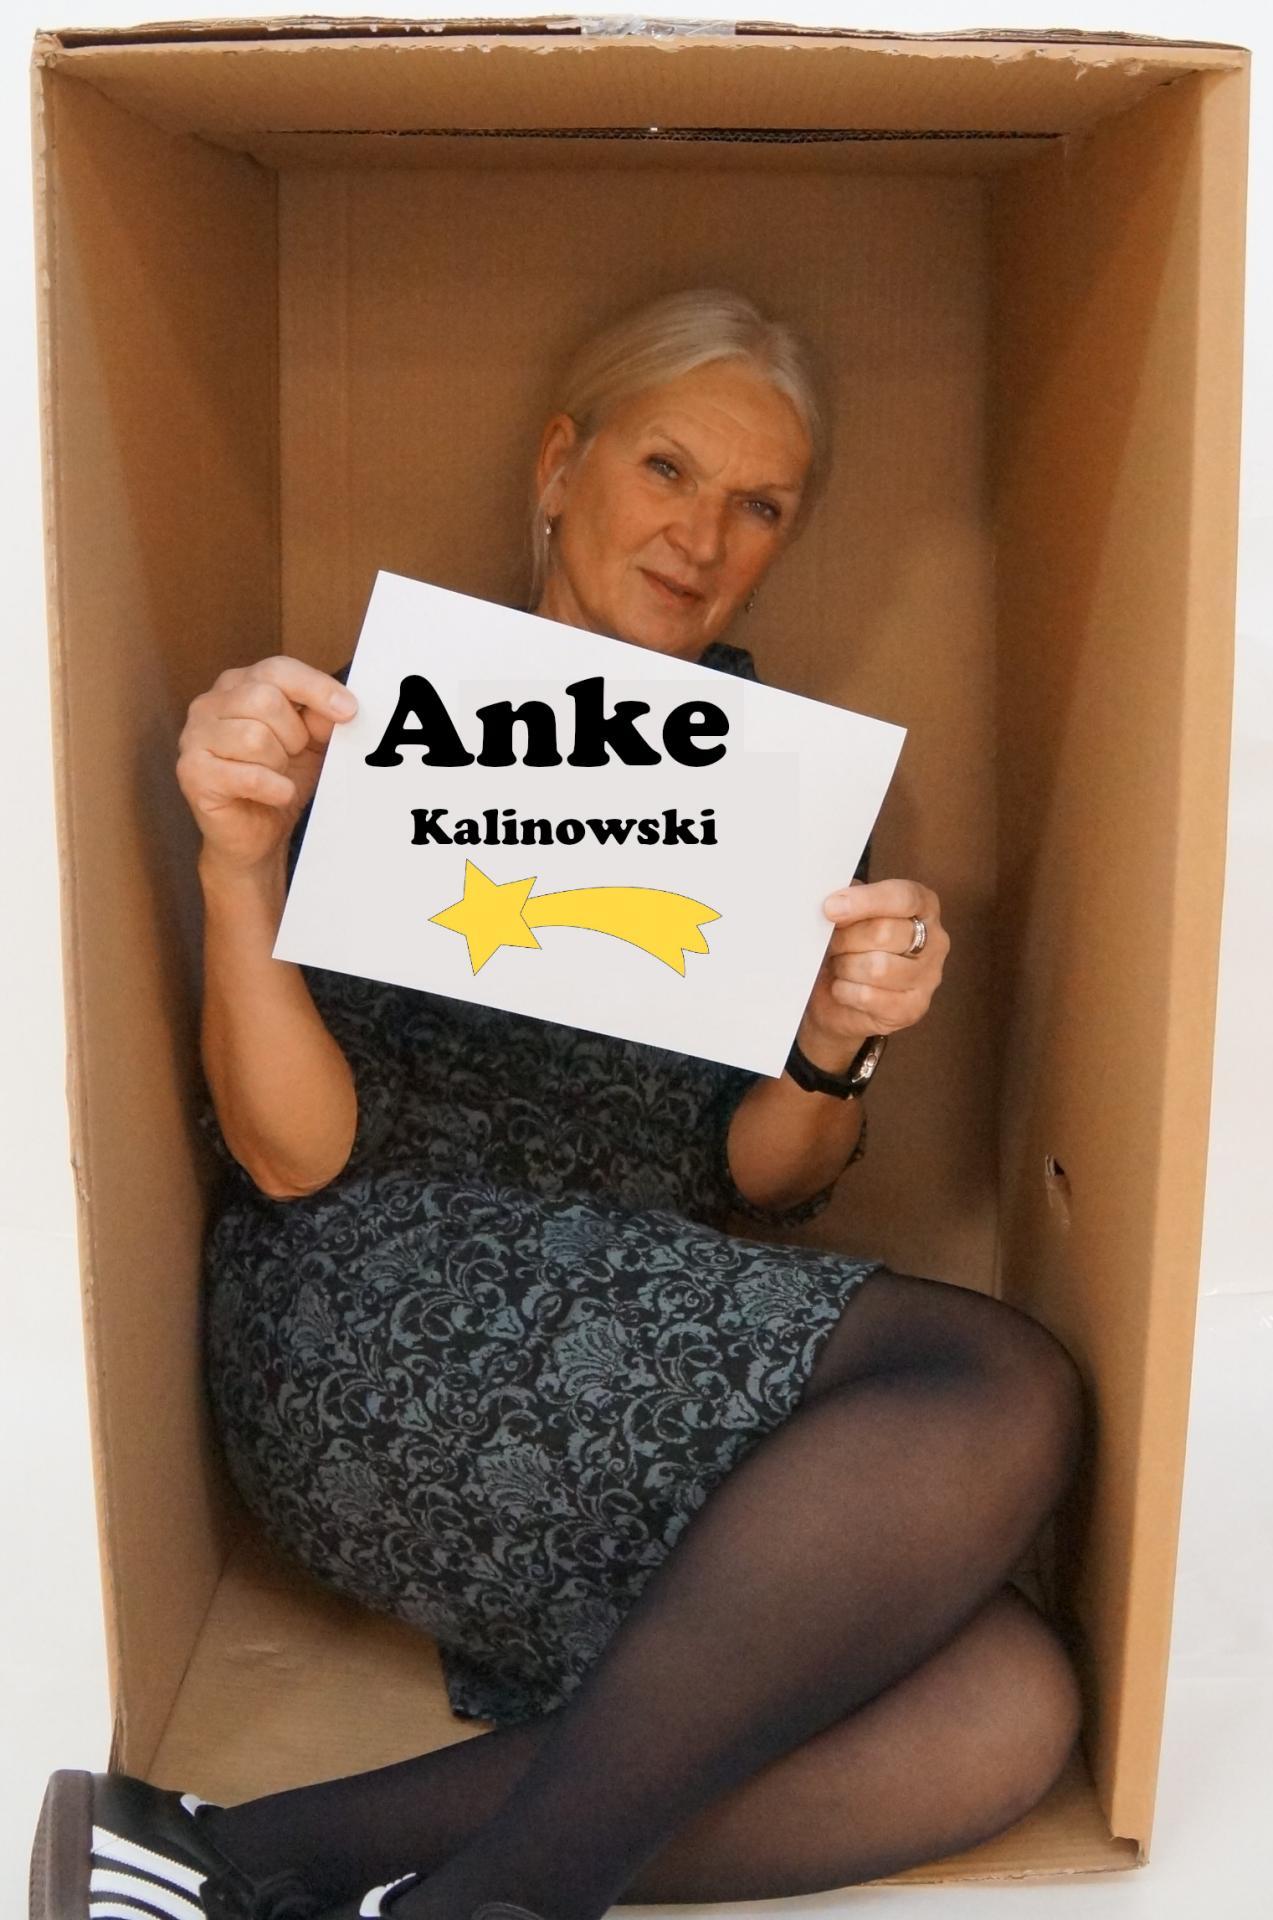 Anke Kalinowski